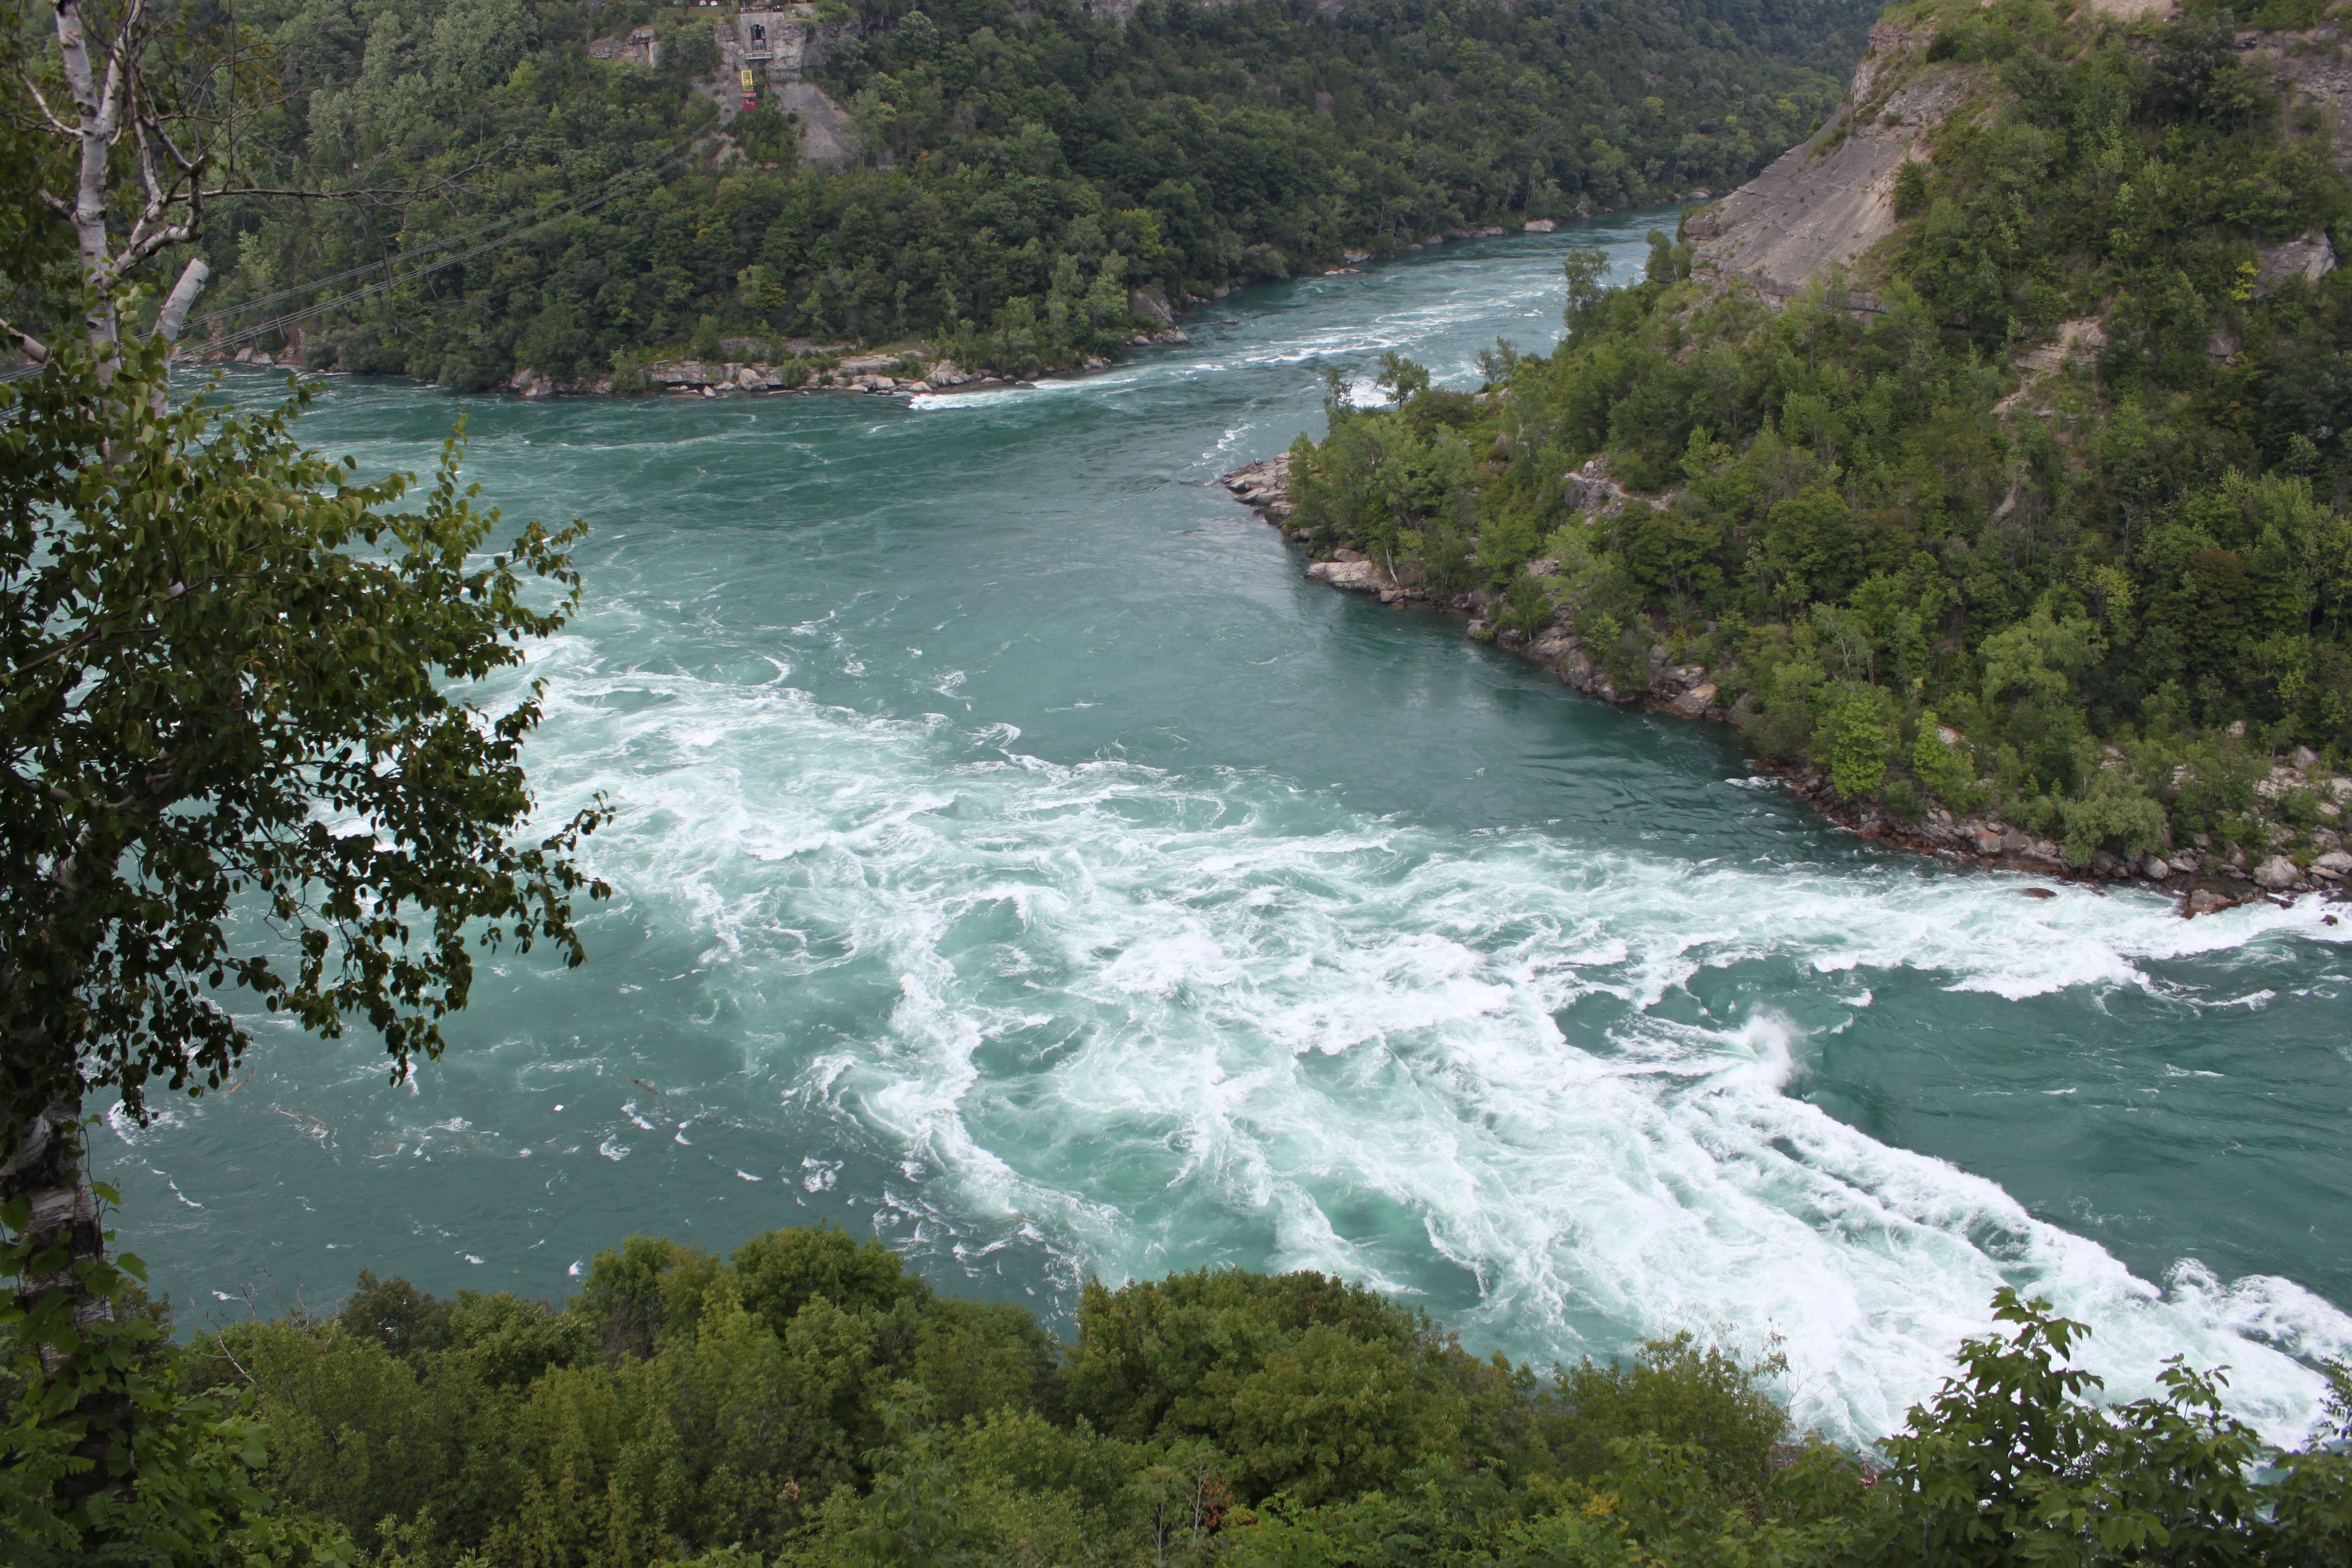 Down stream flow of Niagara Falls. 2015